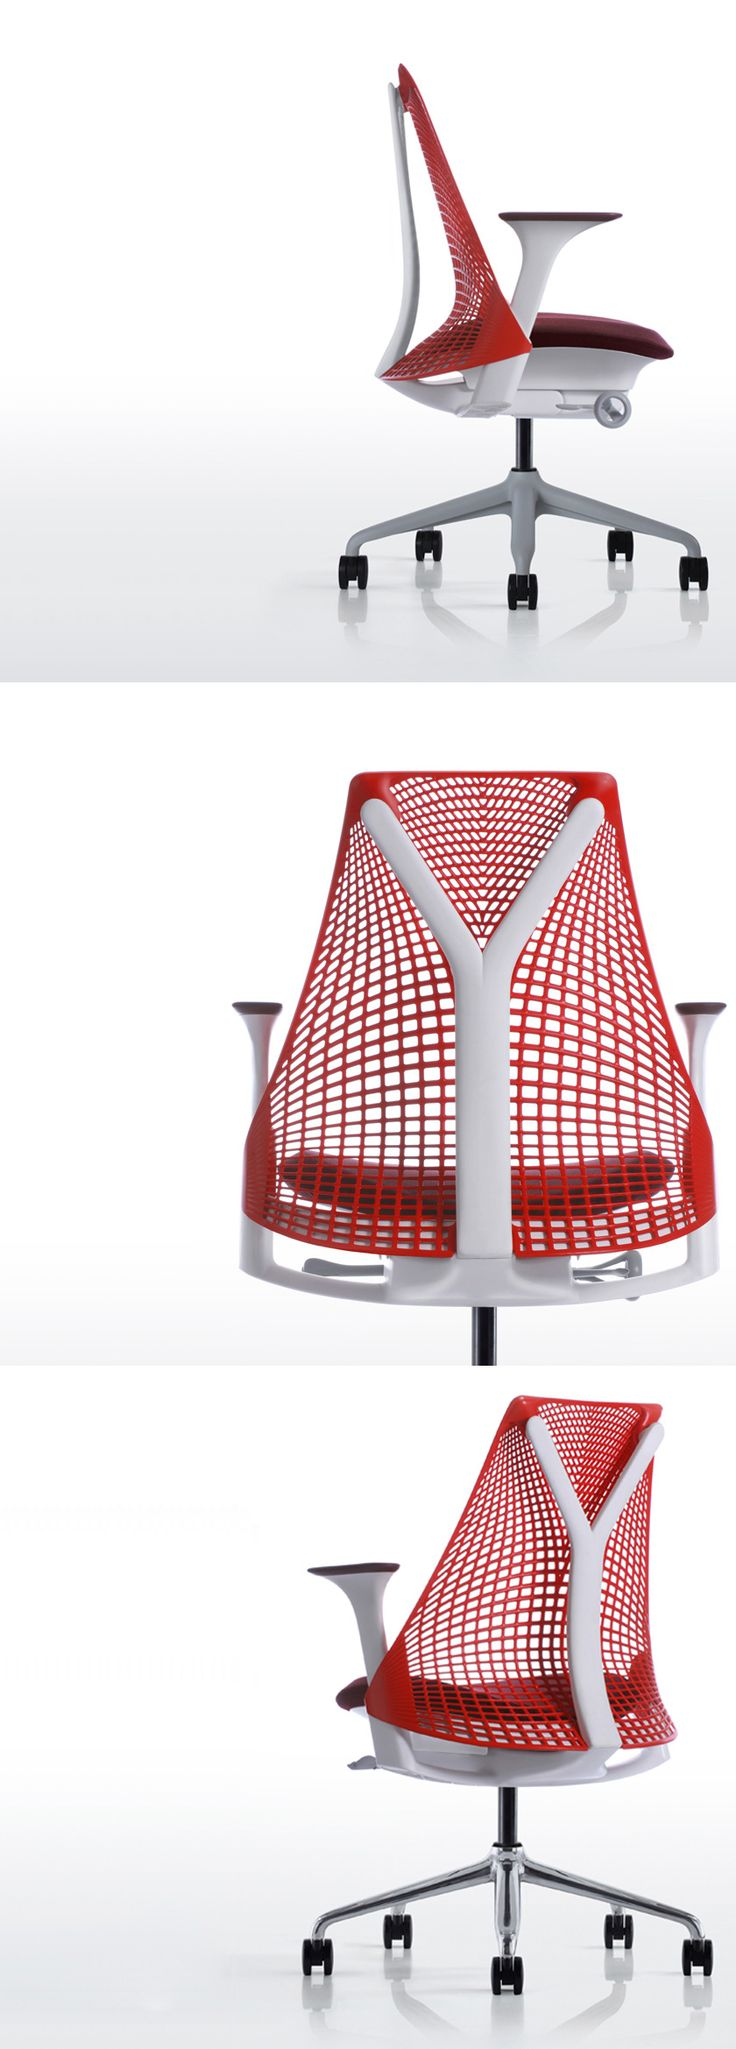 Sayl chair by Yves Behar for Herman Miller. Find Yves Behar's Herman Miller products like the SAYL chair at www.thomasinterior.com